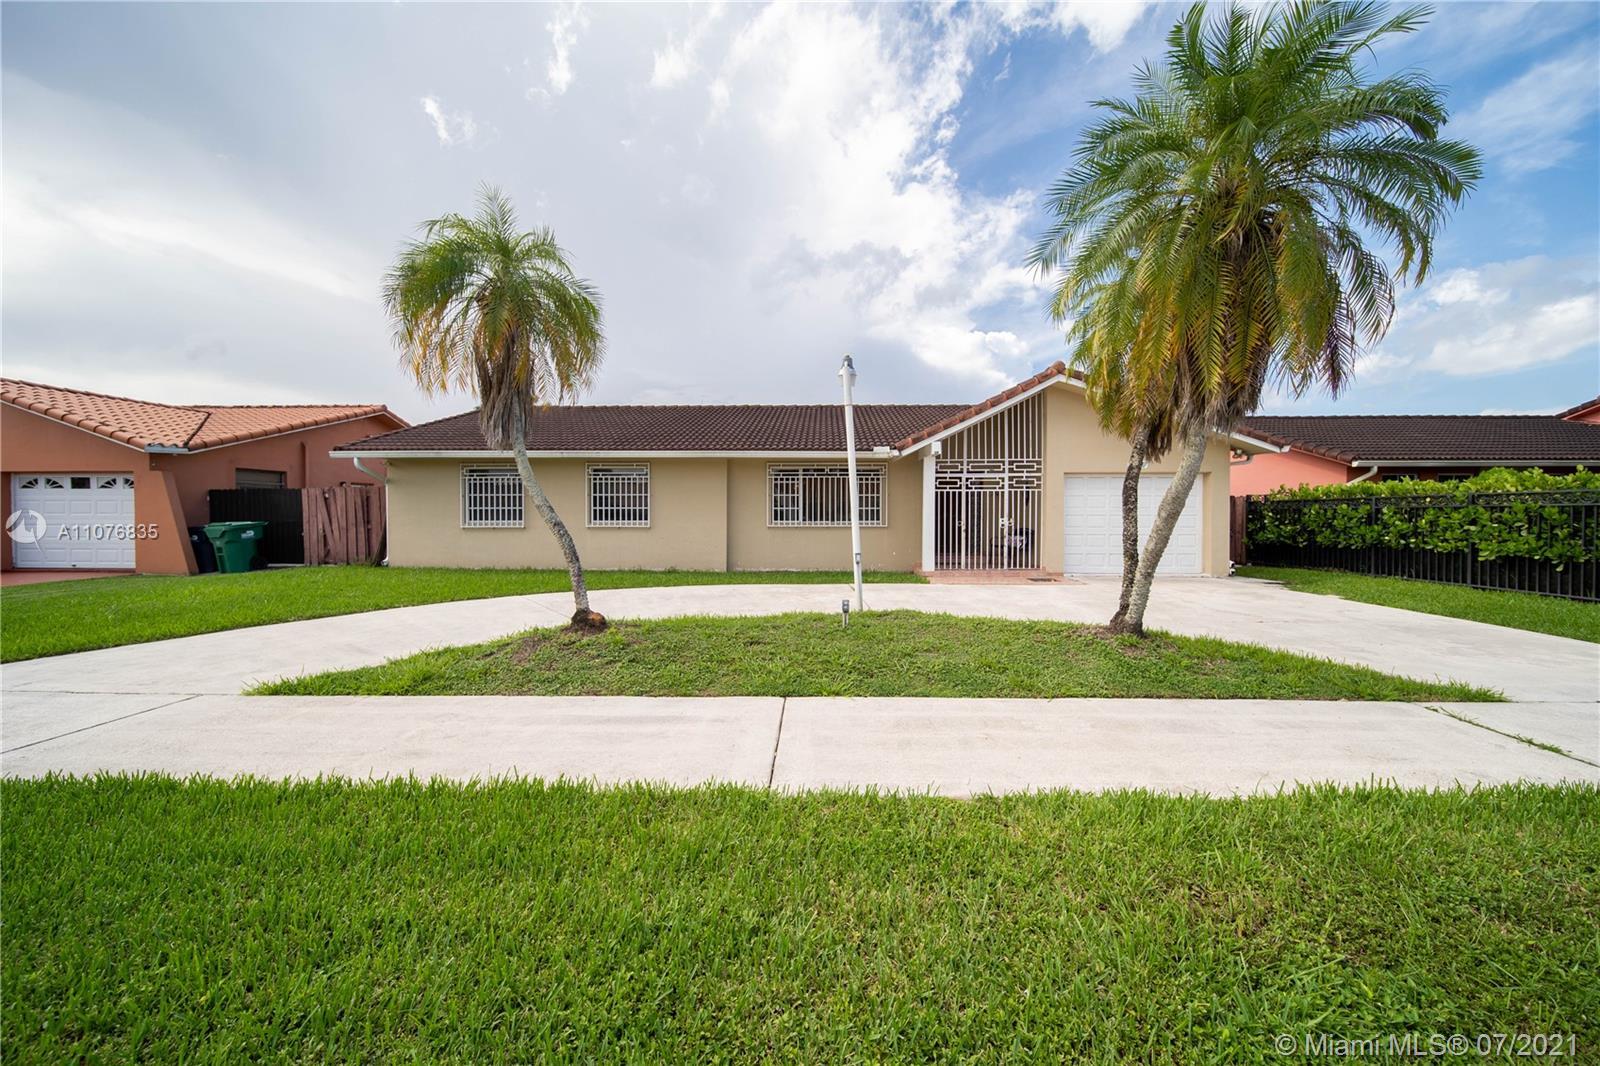 J G Heads Farms - 14031 SW 40th Ter, Miami, FL 33175